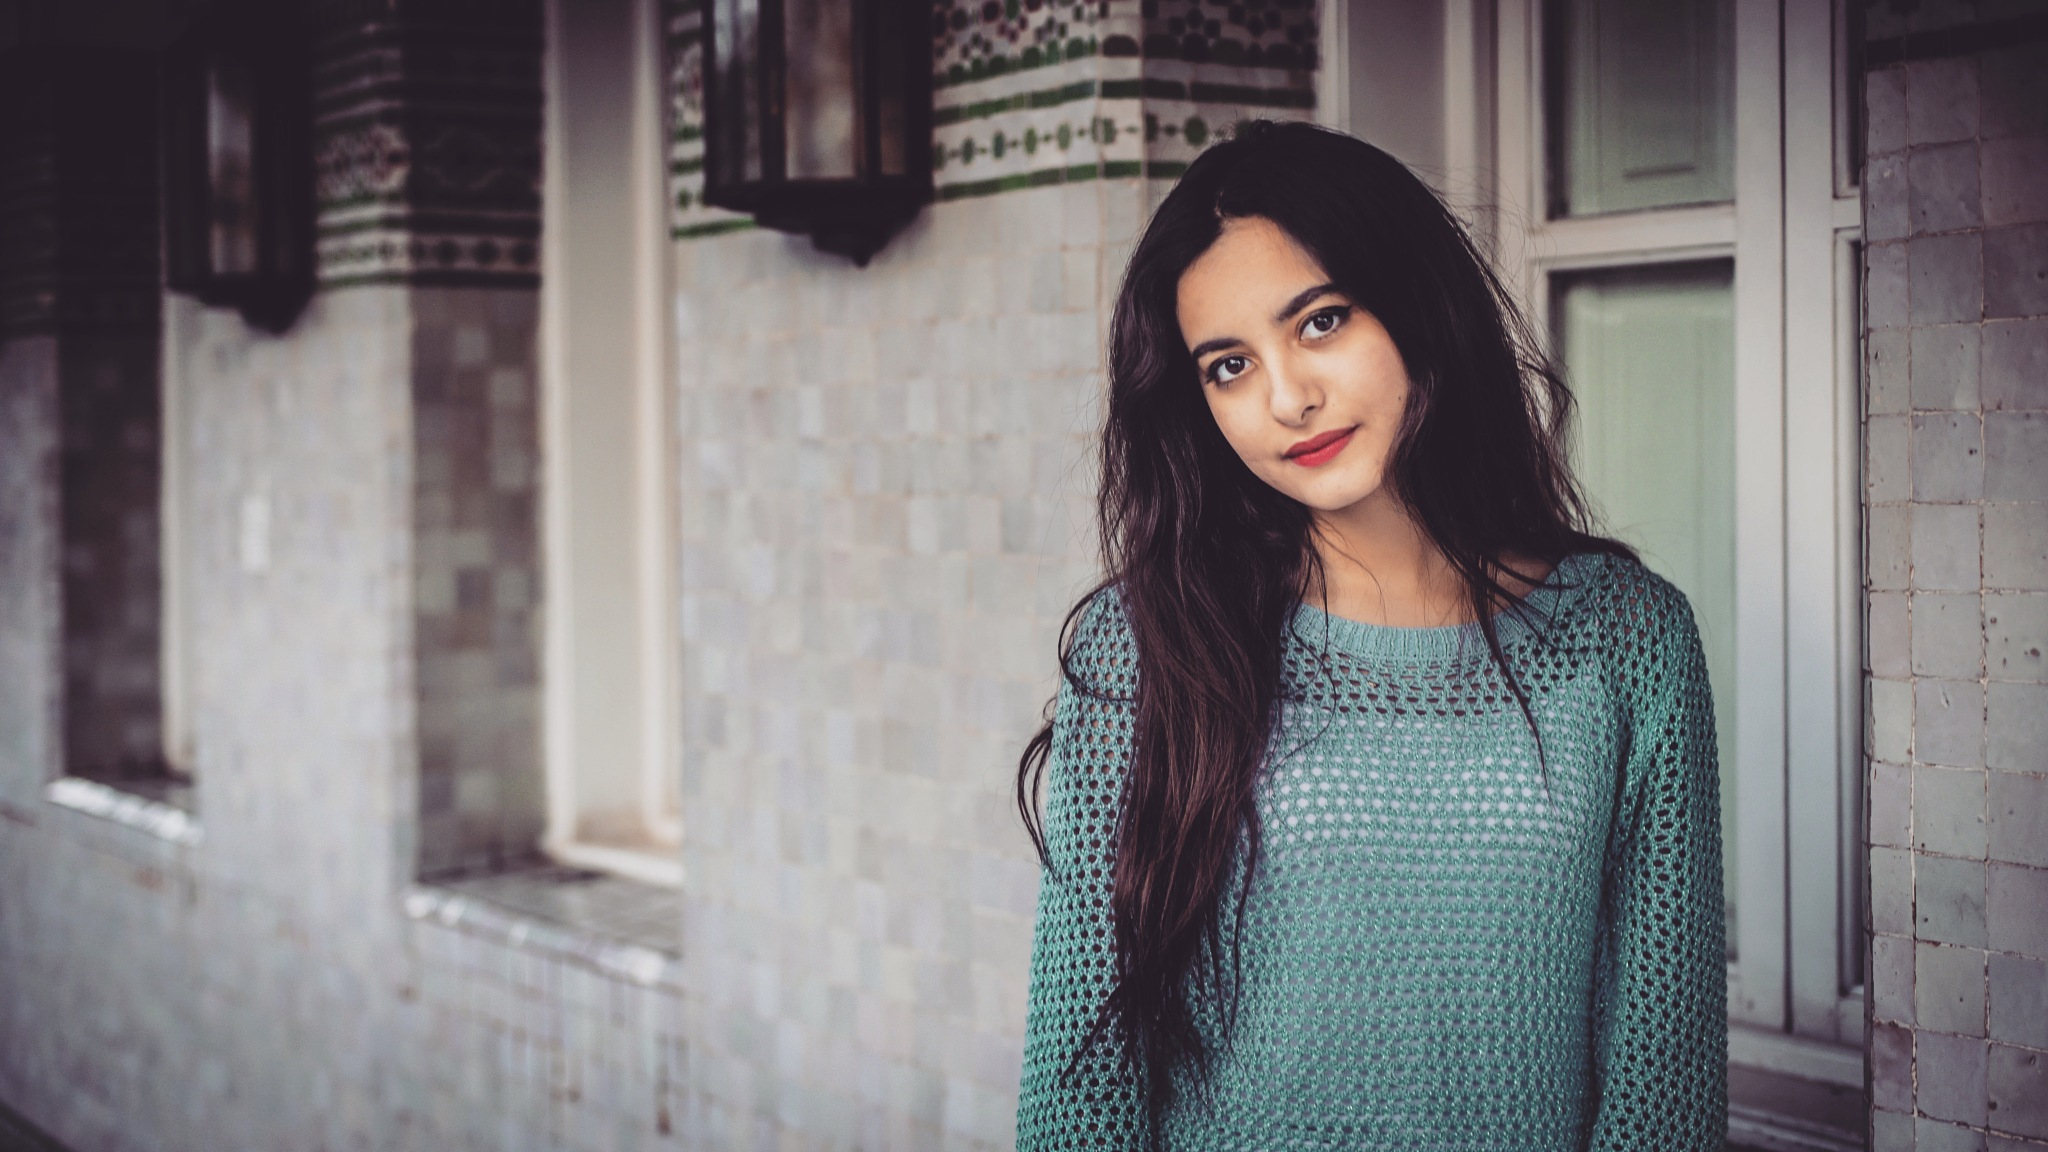 a girl by haddouchitarik